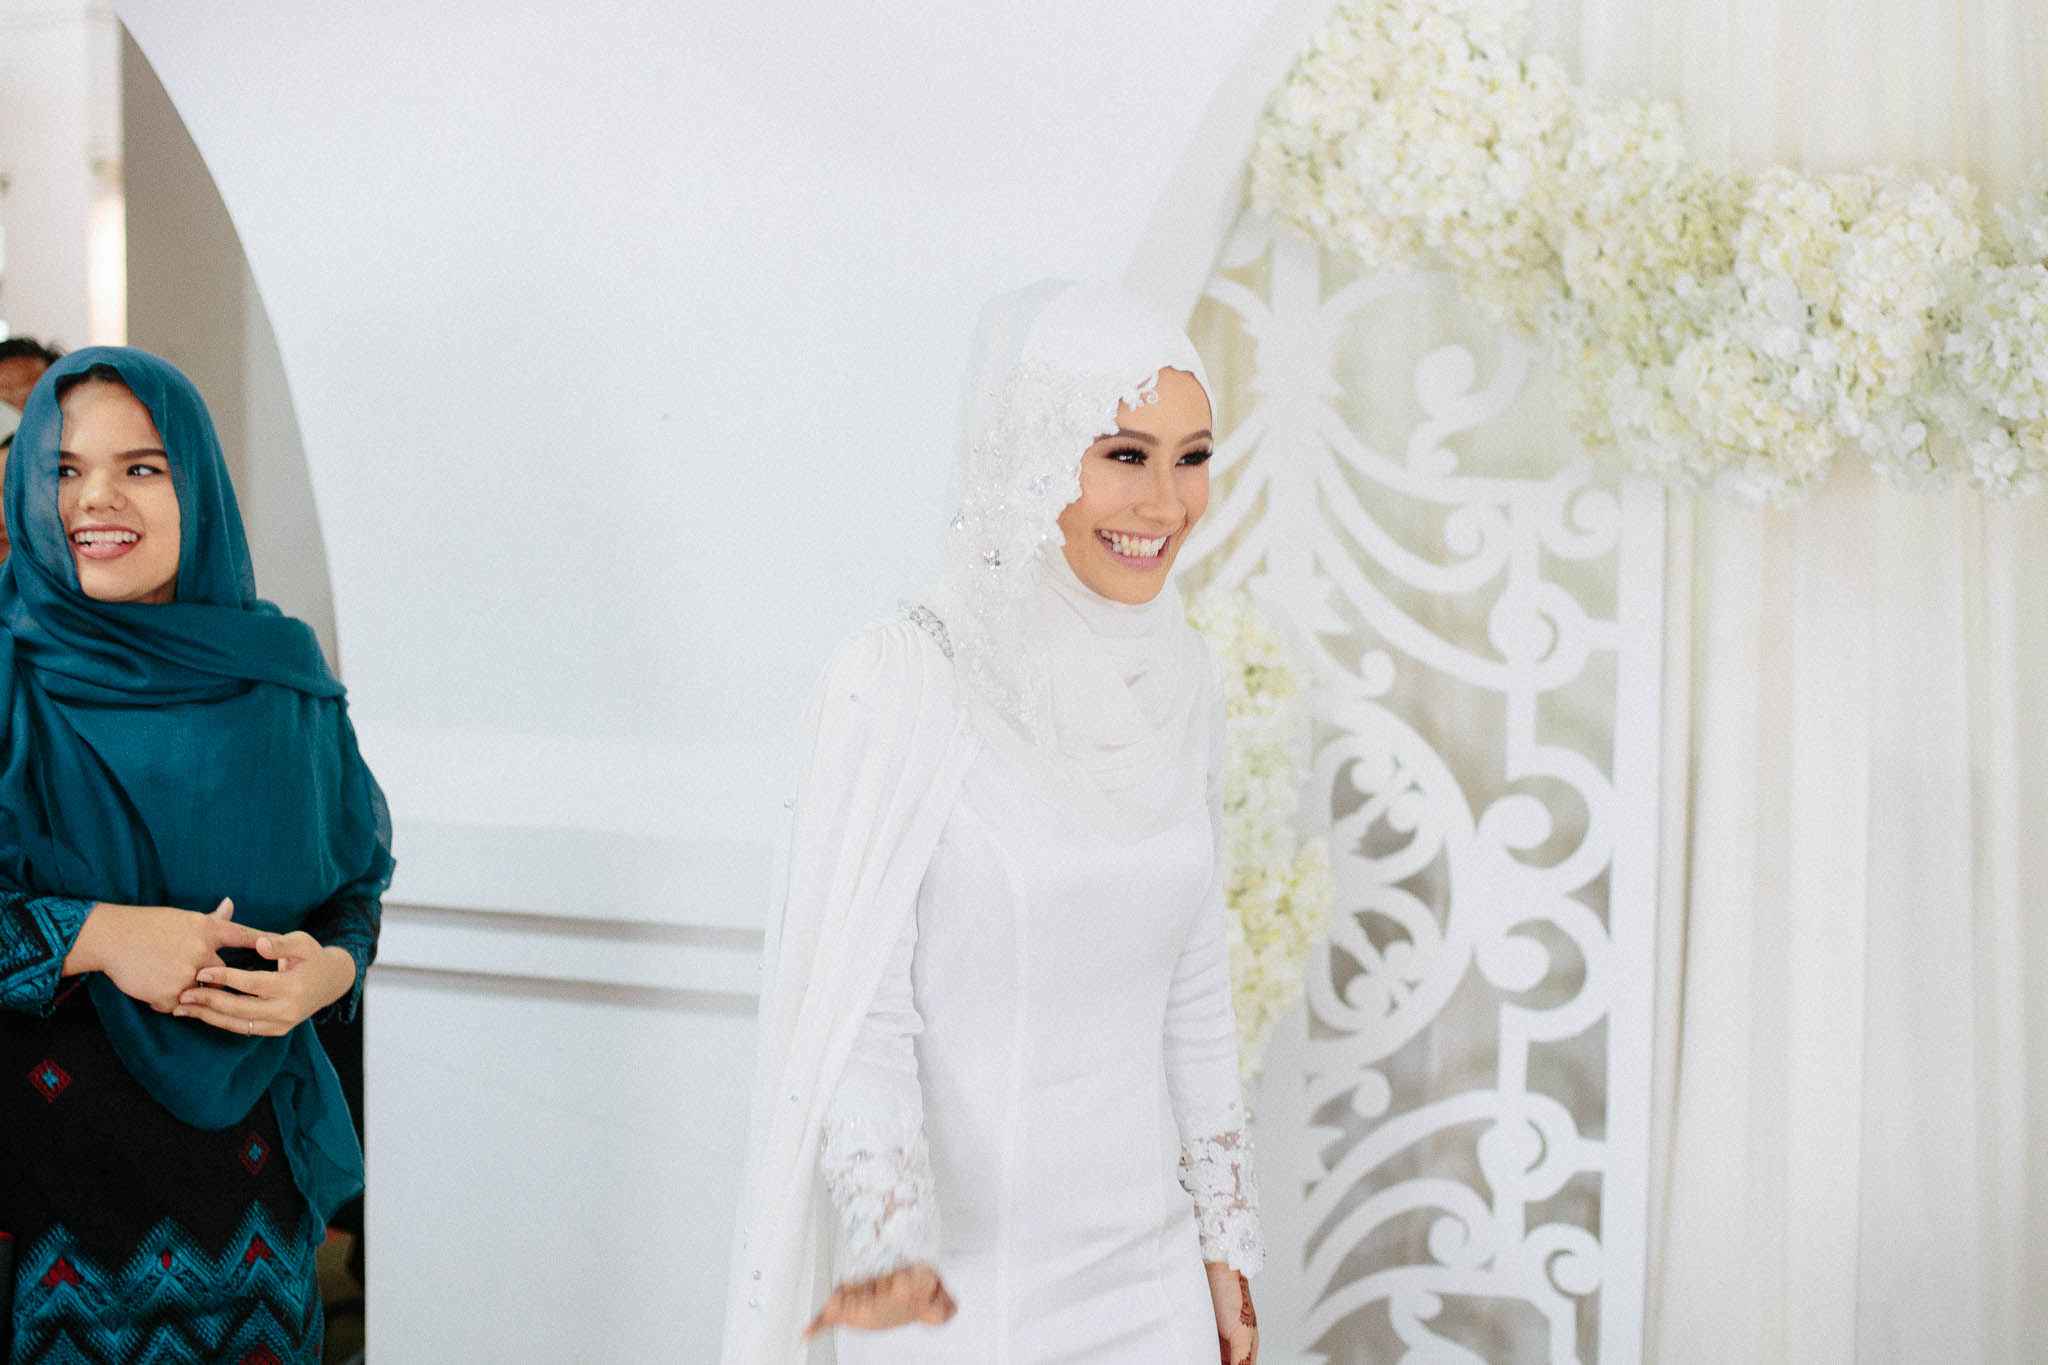 singapore-wedding-photographer-sarah-razif-34.jpg